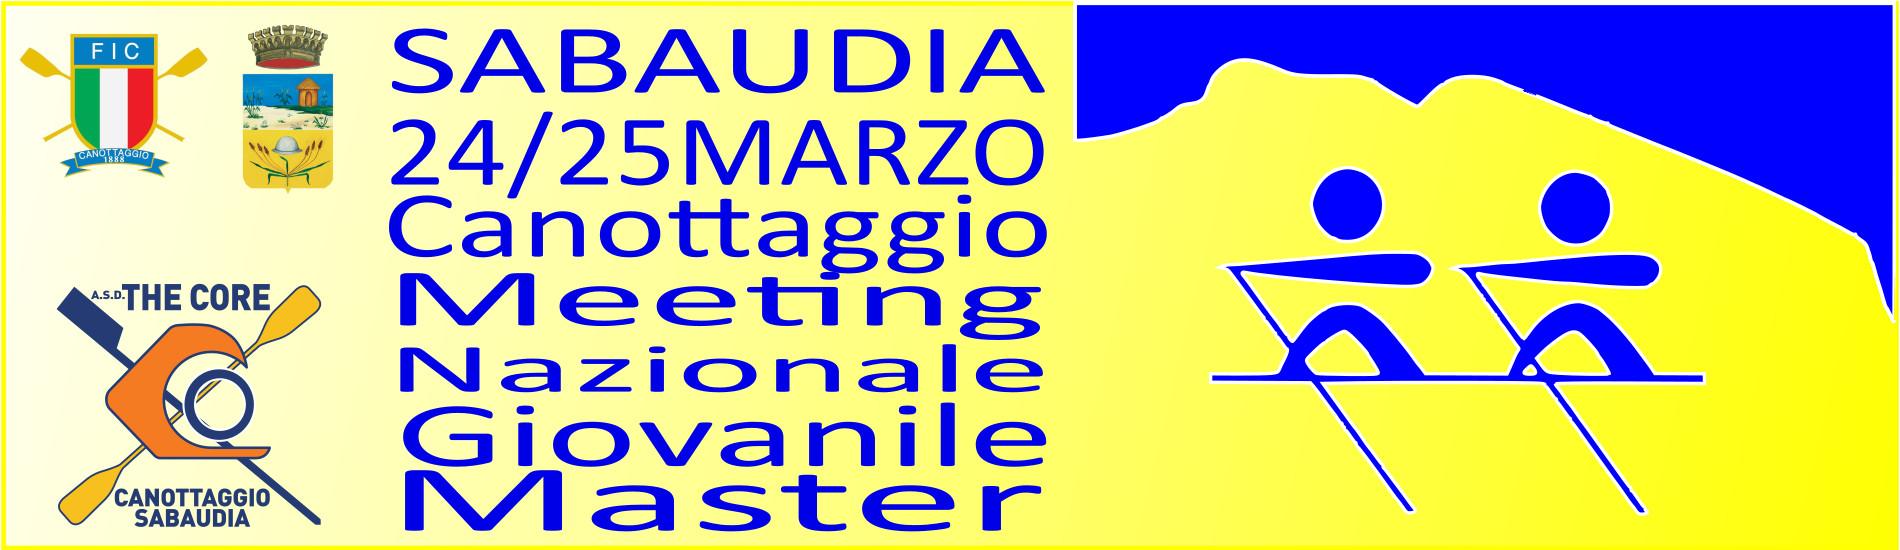 Sabaudia 24/25 Marzo Meeting Nazionale Giovanile e Master